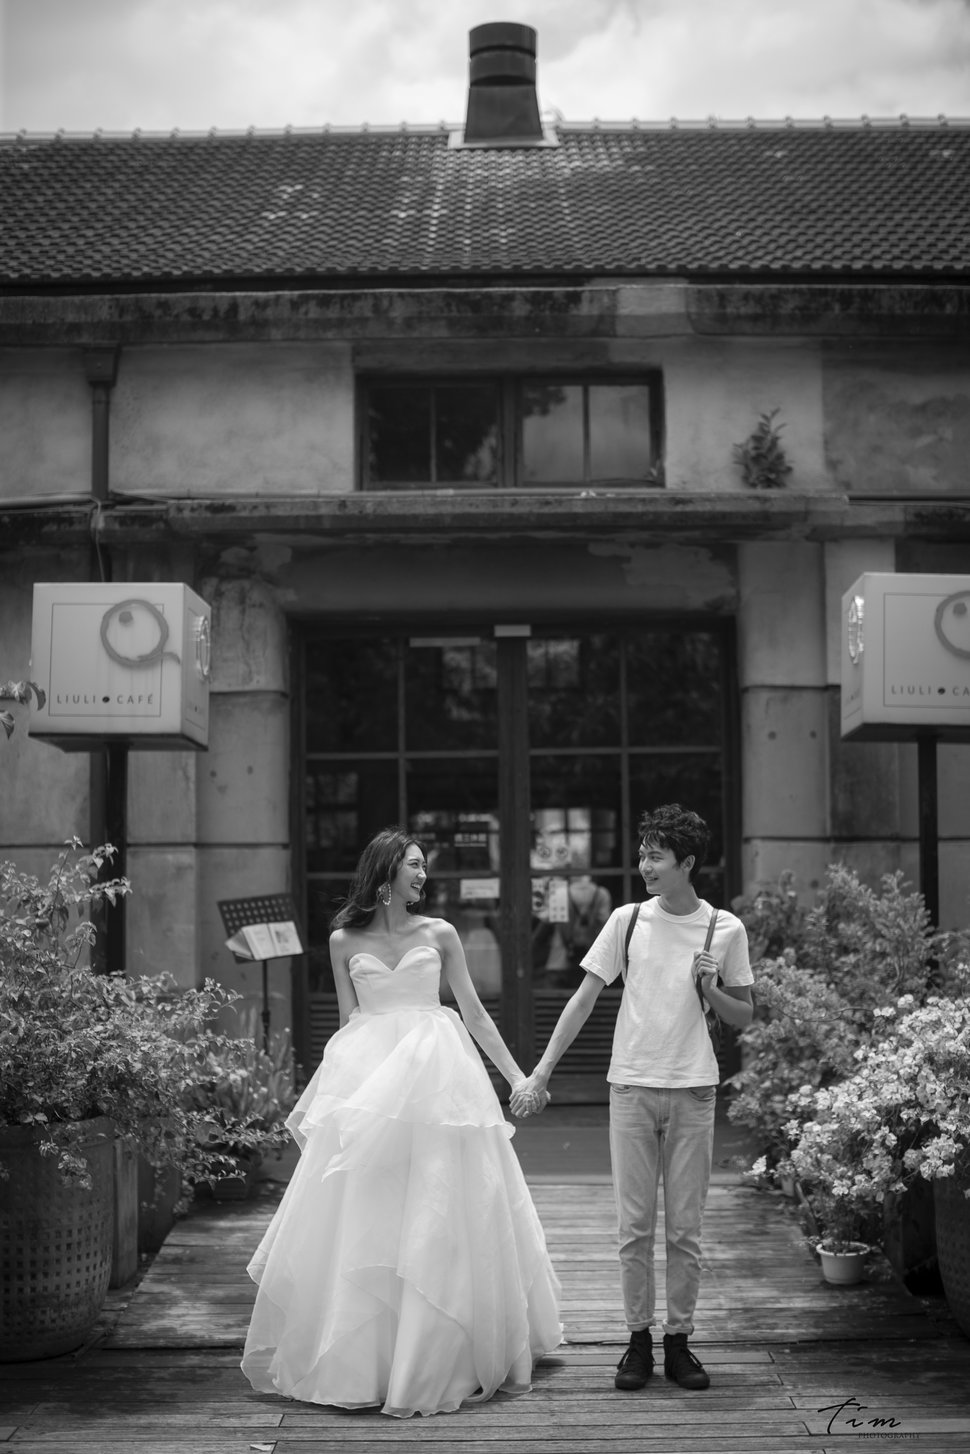 TIM_3134 - 提姆 Tim photography《結婚吧》